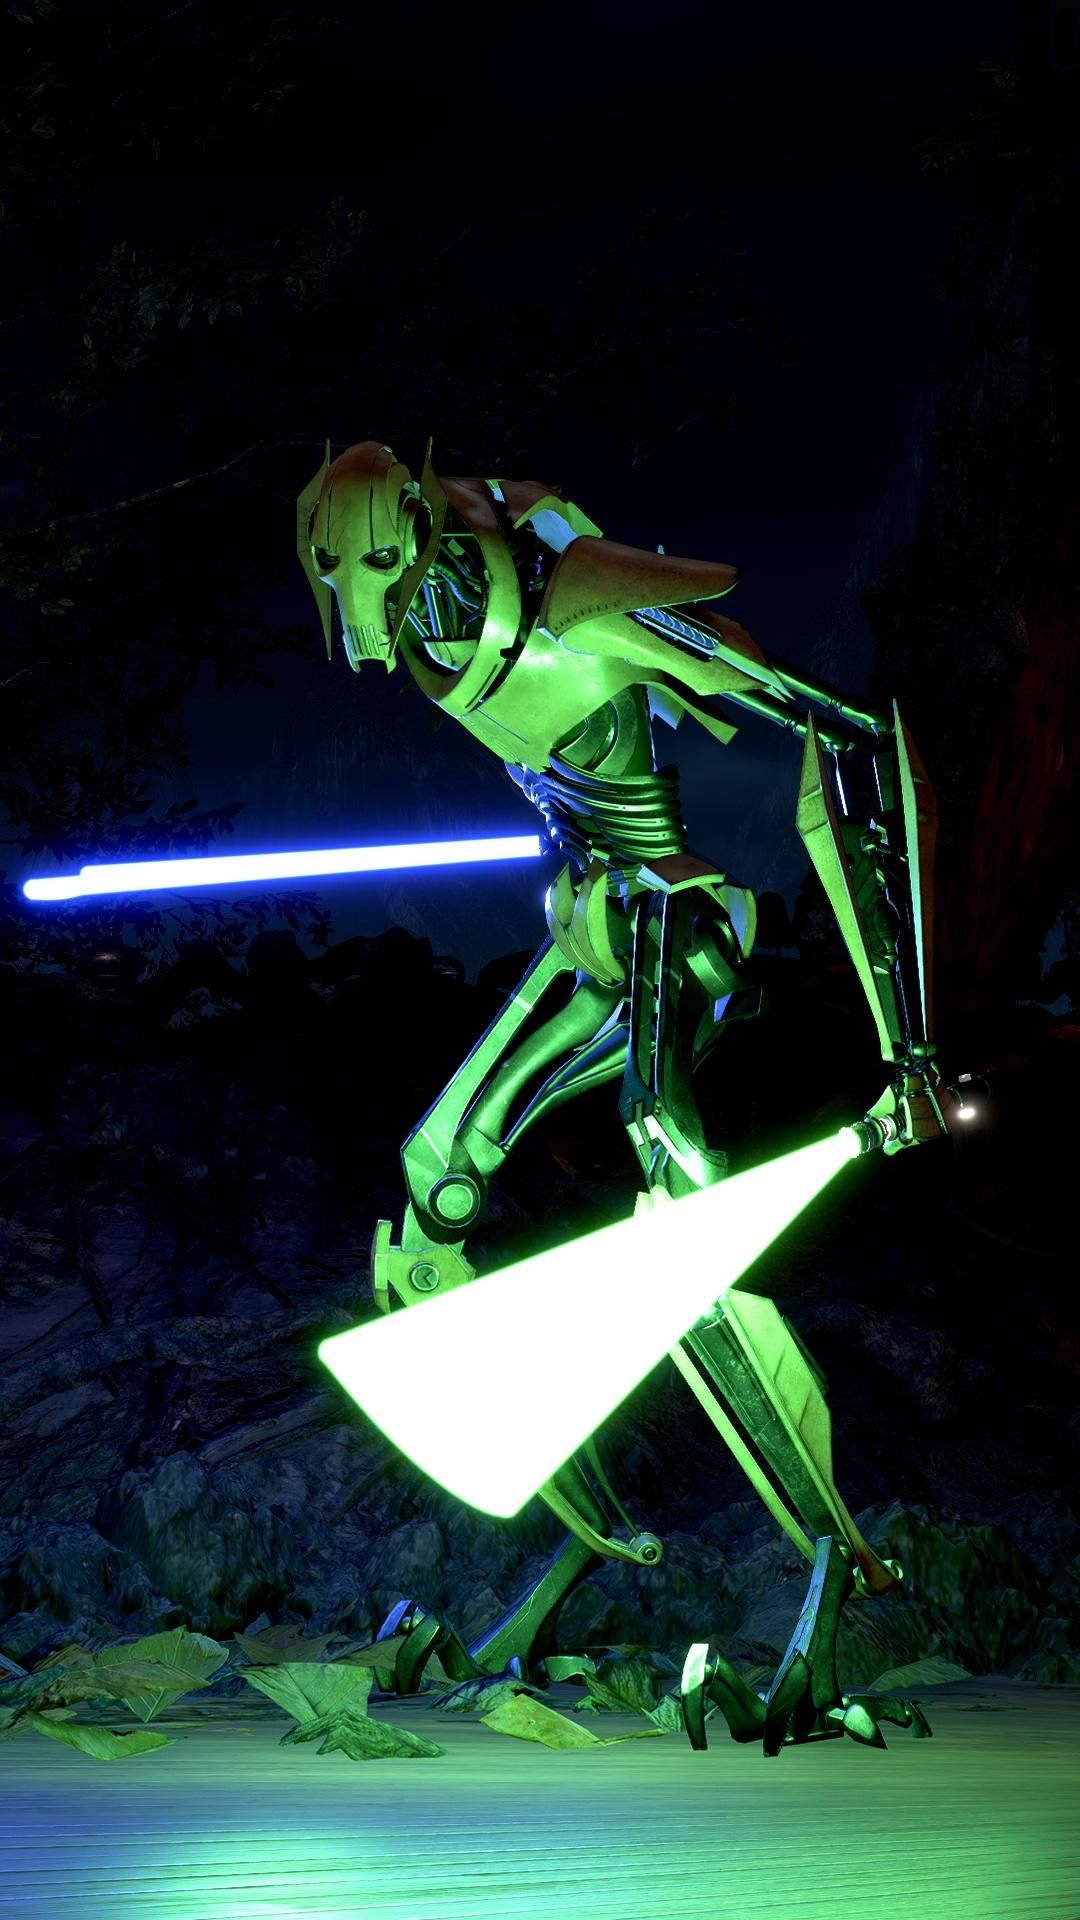 Epic Star Wars Battlefront Iphone Background In 2020 Star Wars Images Star Wars Painting Star Wars Art